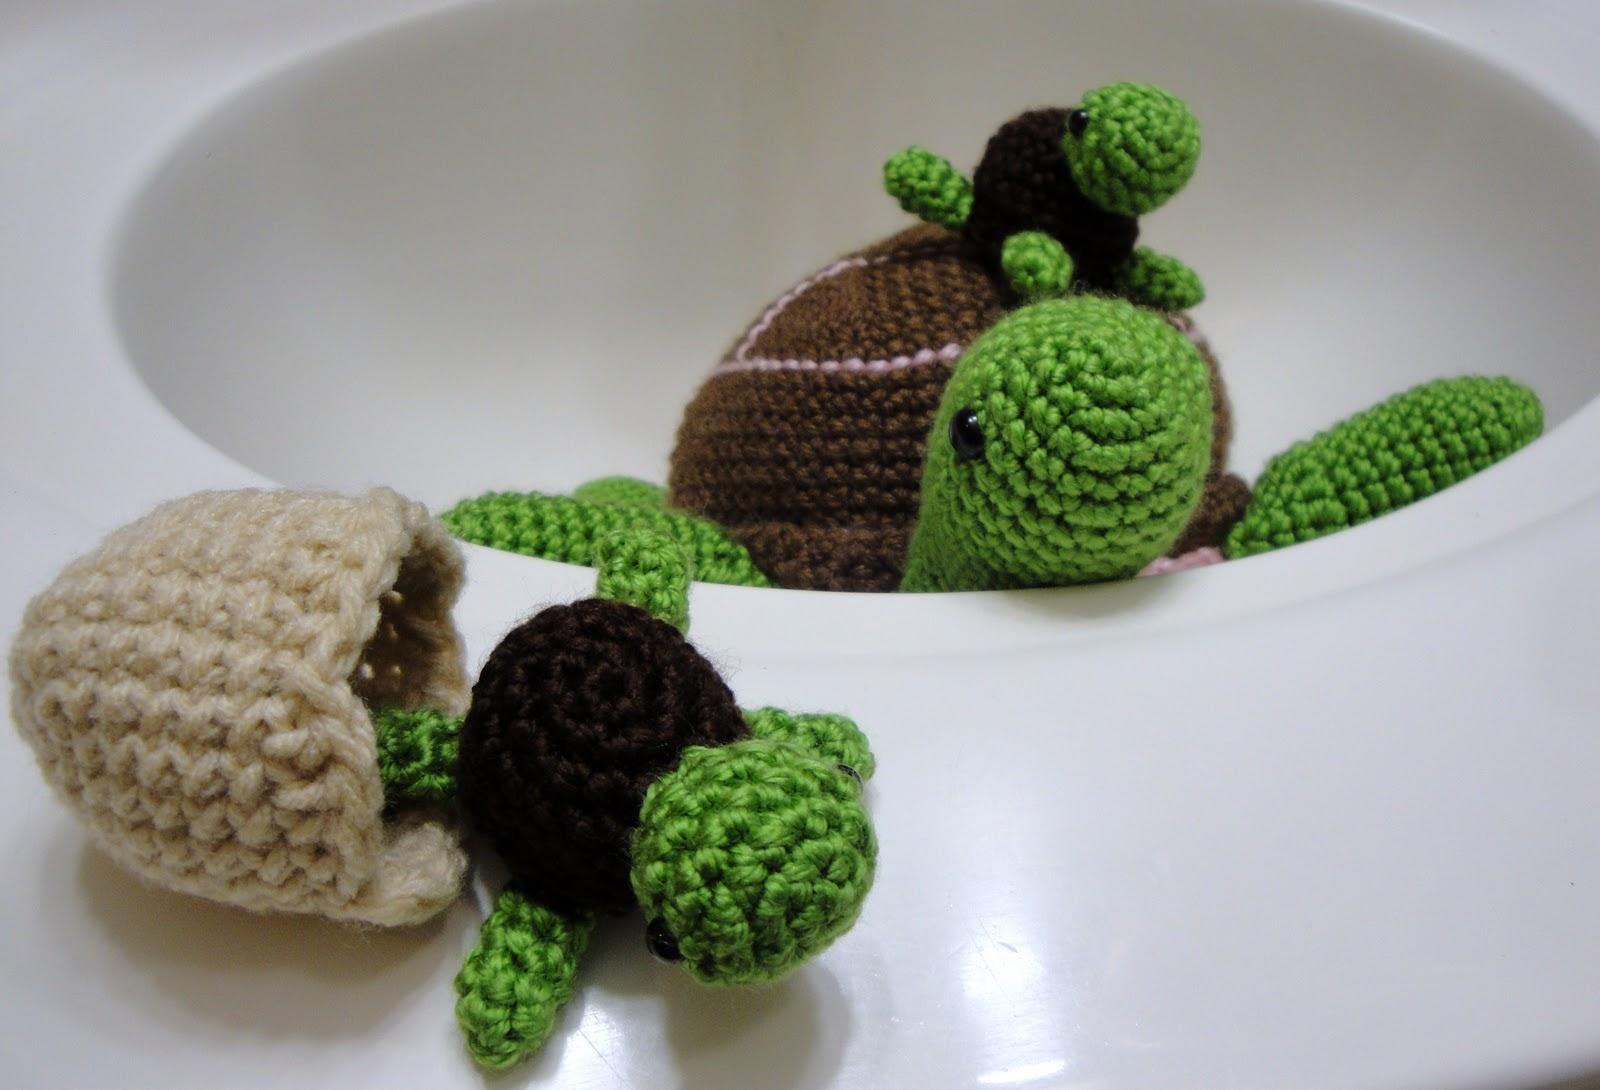 i ♥ amicute: a bale of turtles